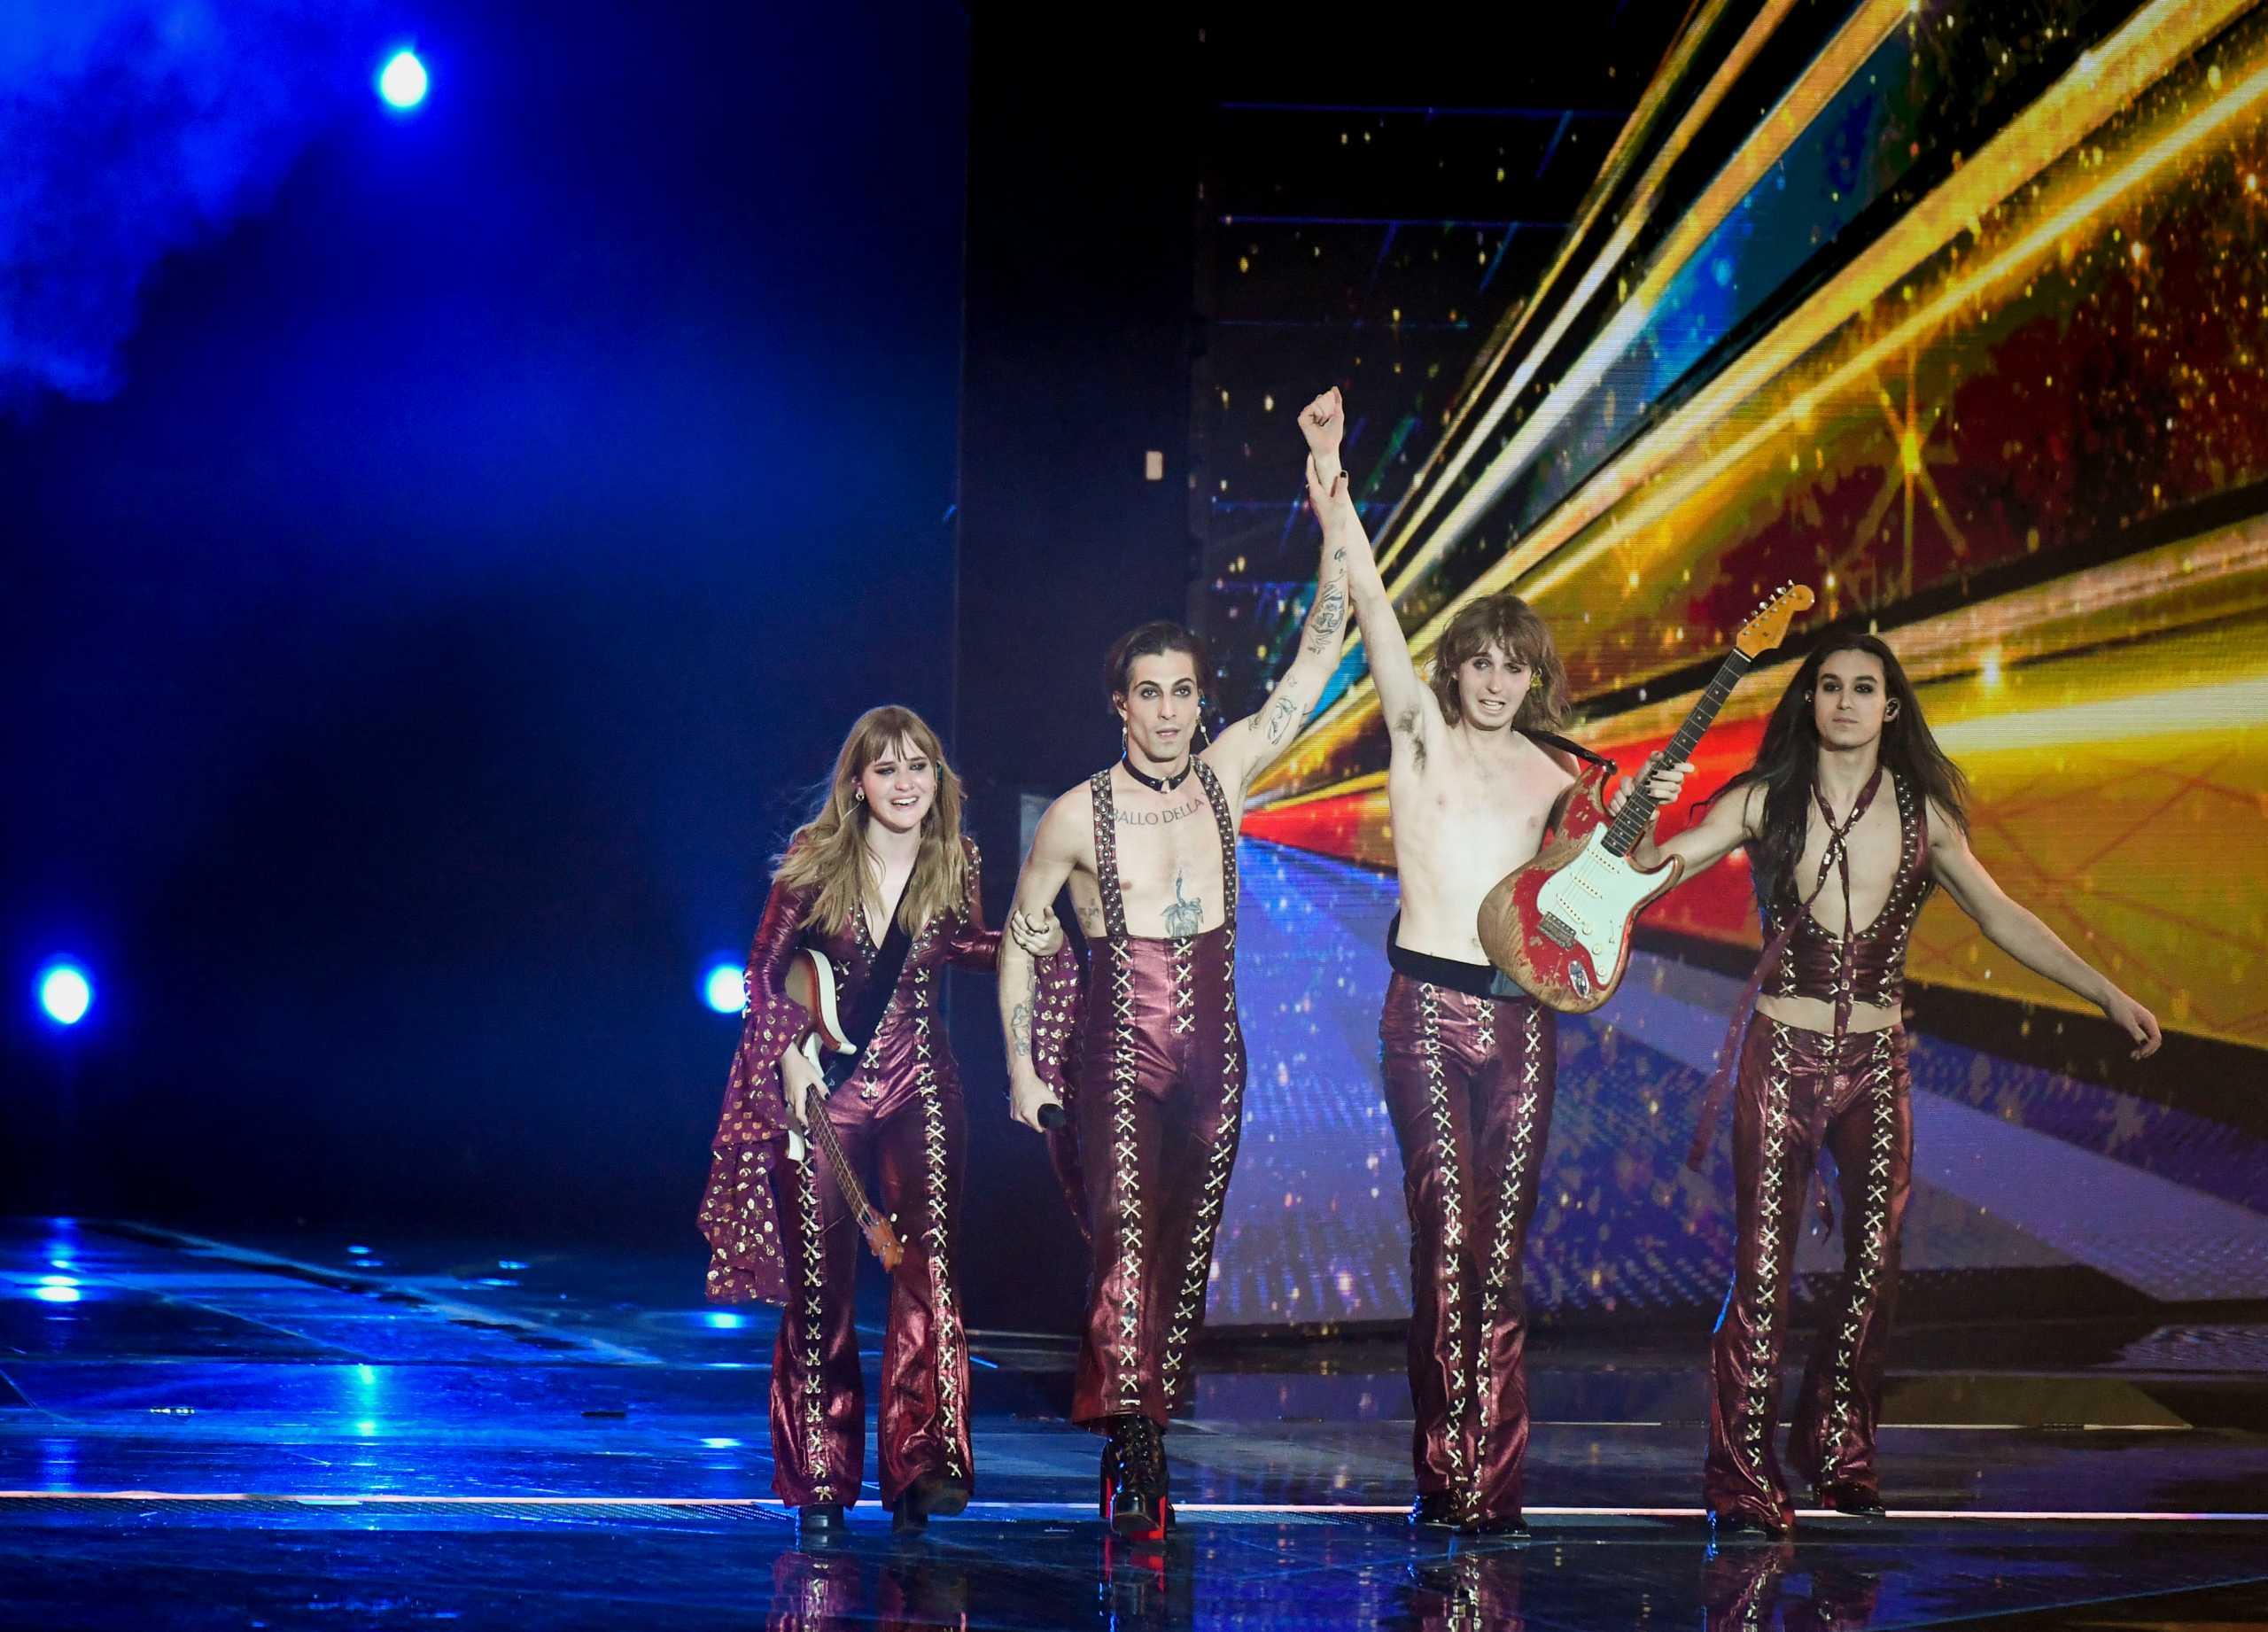 Eurovision 2021: Η νίκη της Ιταλίας και η επιστροφή των Big Five (video)